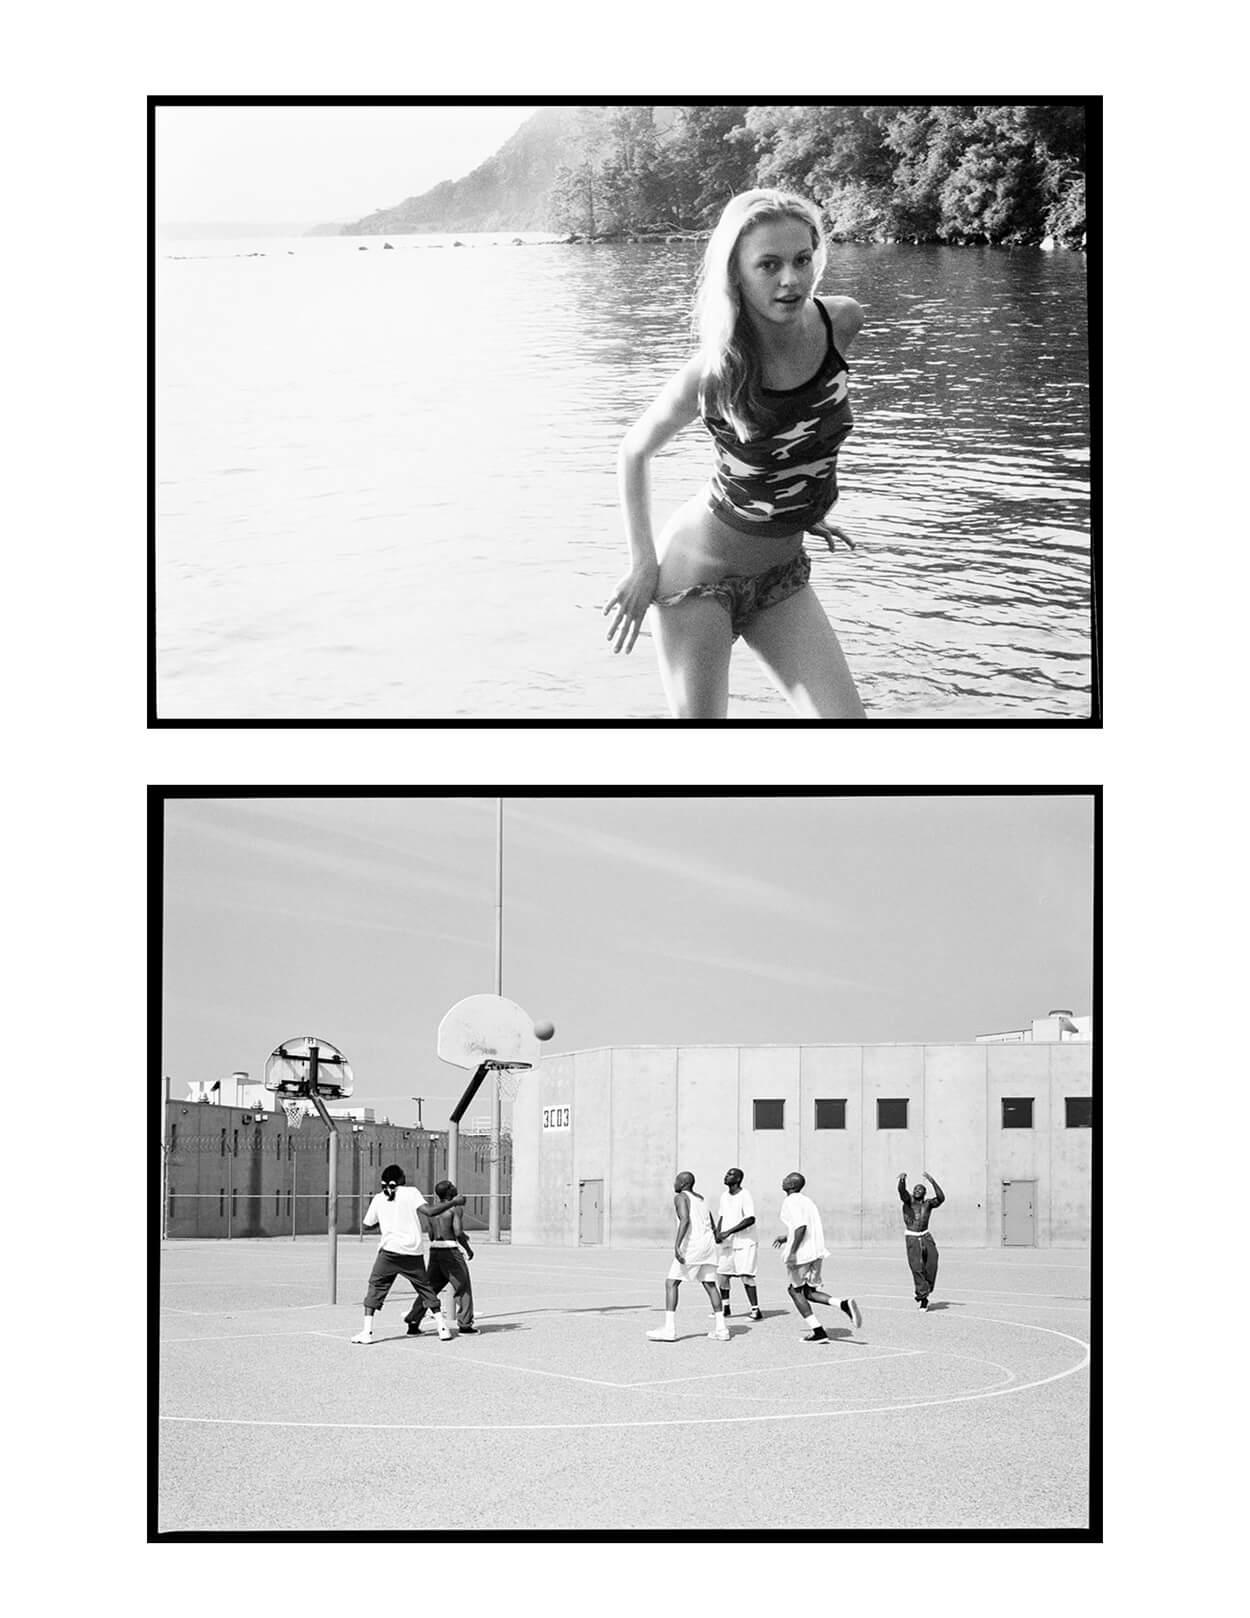 Hunter Barnes documents America's fringe communities in Roadbook - Popular Photography - Popular Photography - Page 6